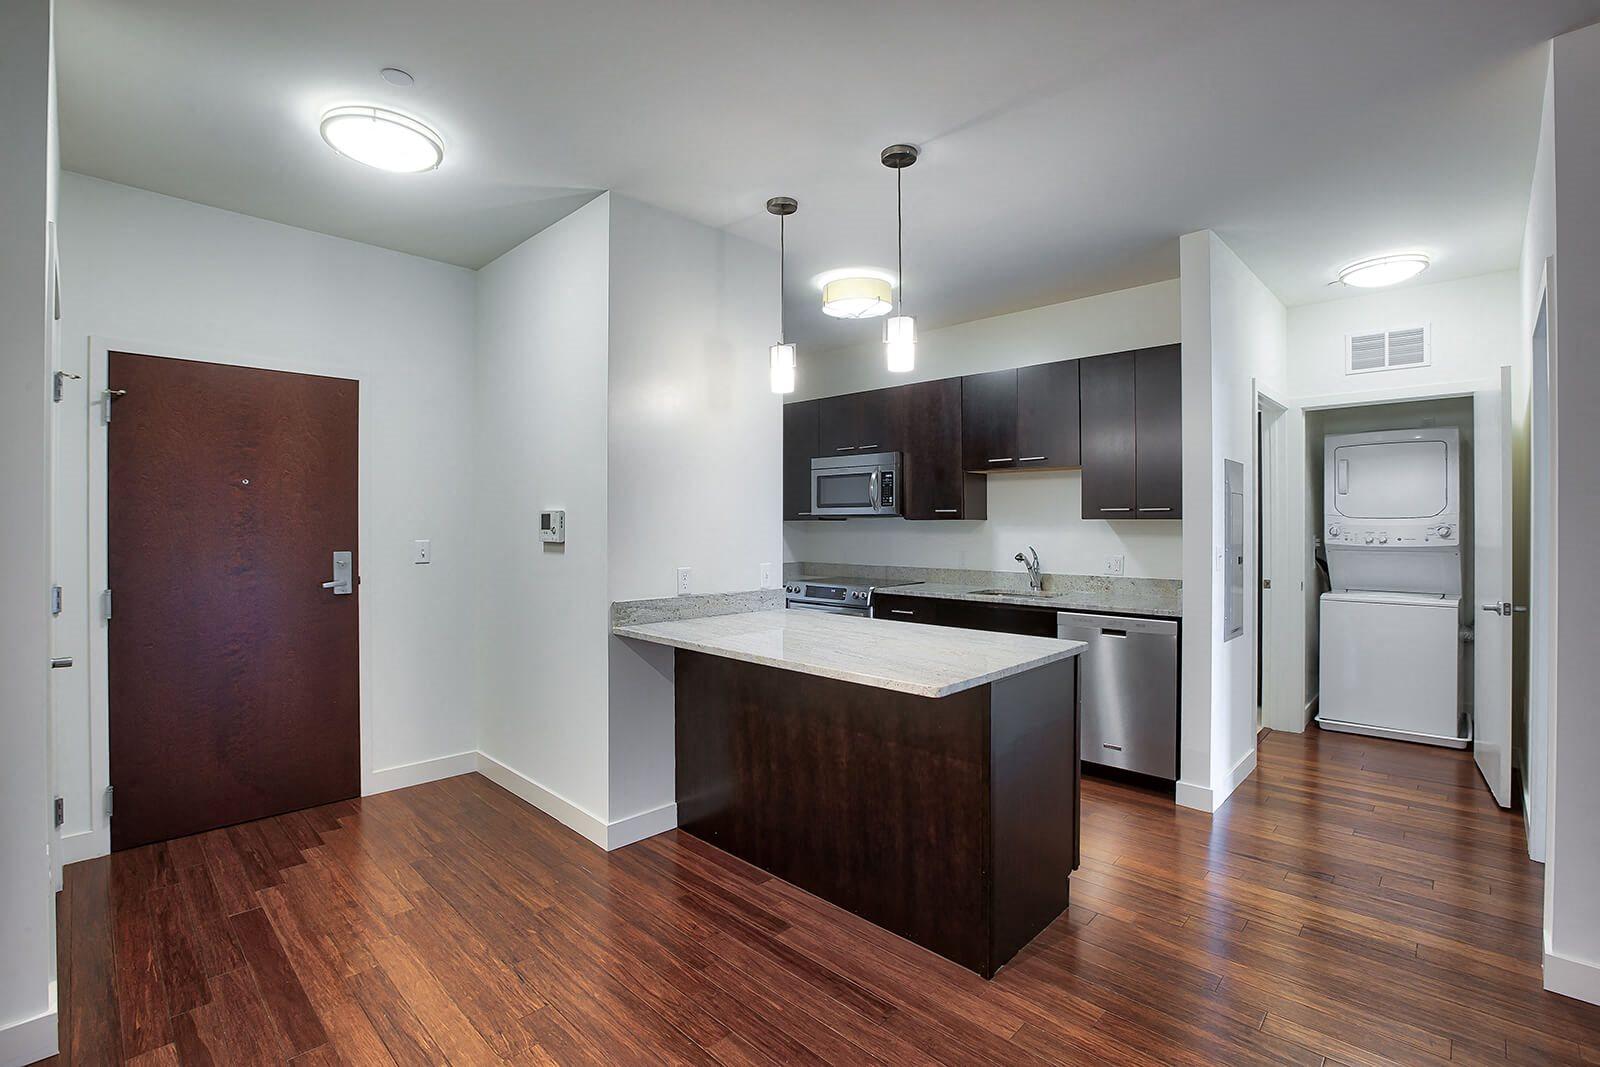 Modern Interior Finishes at Windsor at Maxwells Green, Somerville, Massachusetts